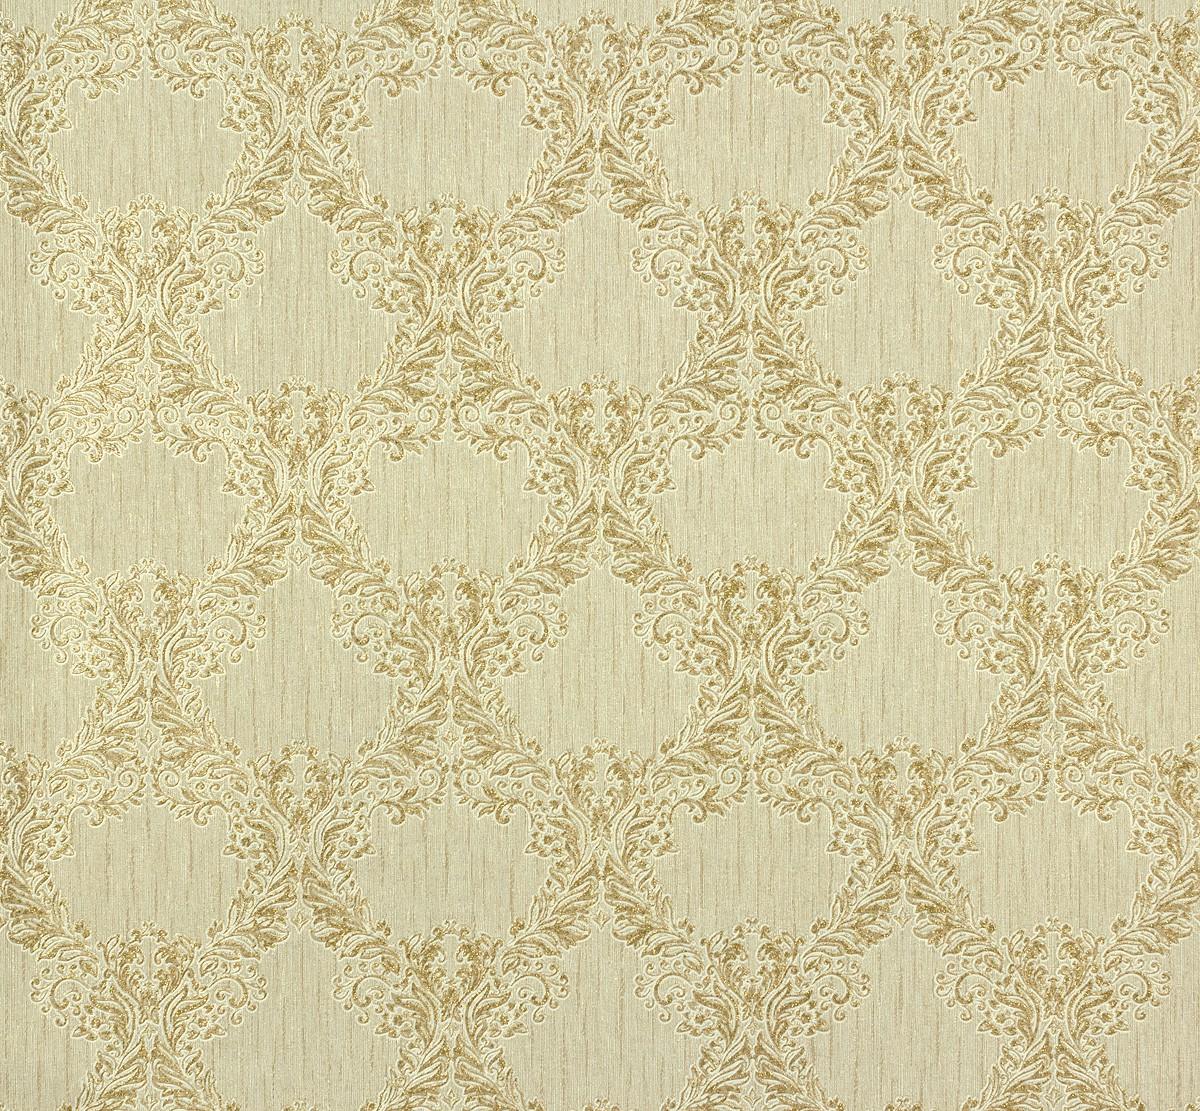 vliestapete barock creme gold tapete p s como 02355 40 0235540. Black Bedroom Furniture Sets. Home Design Ideas